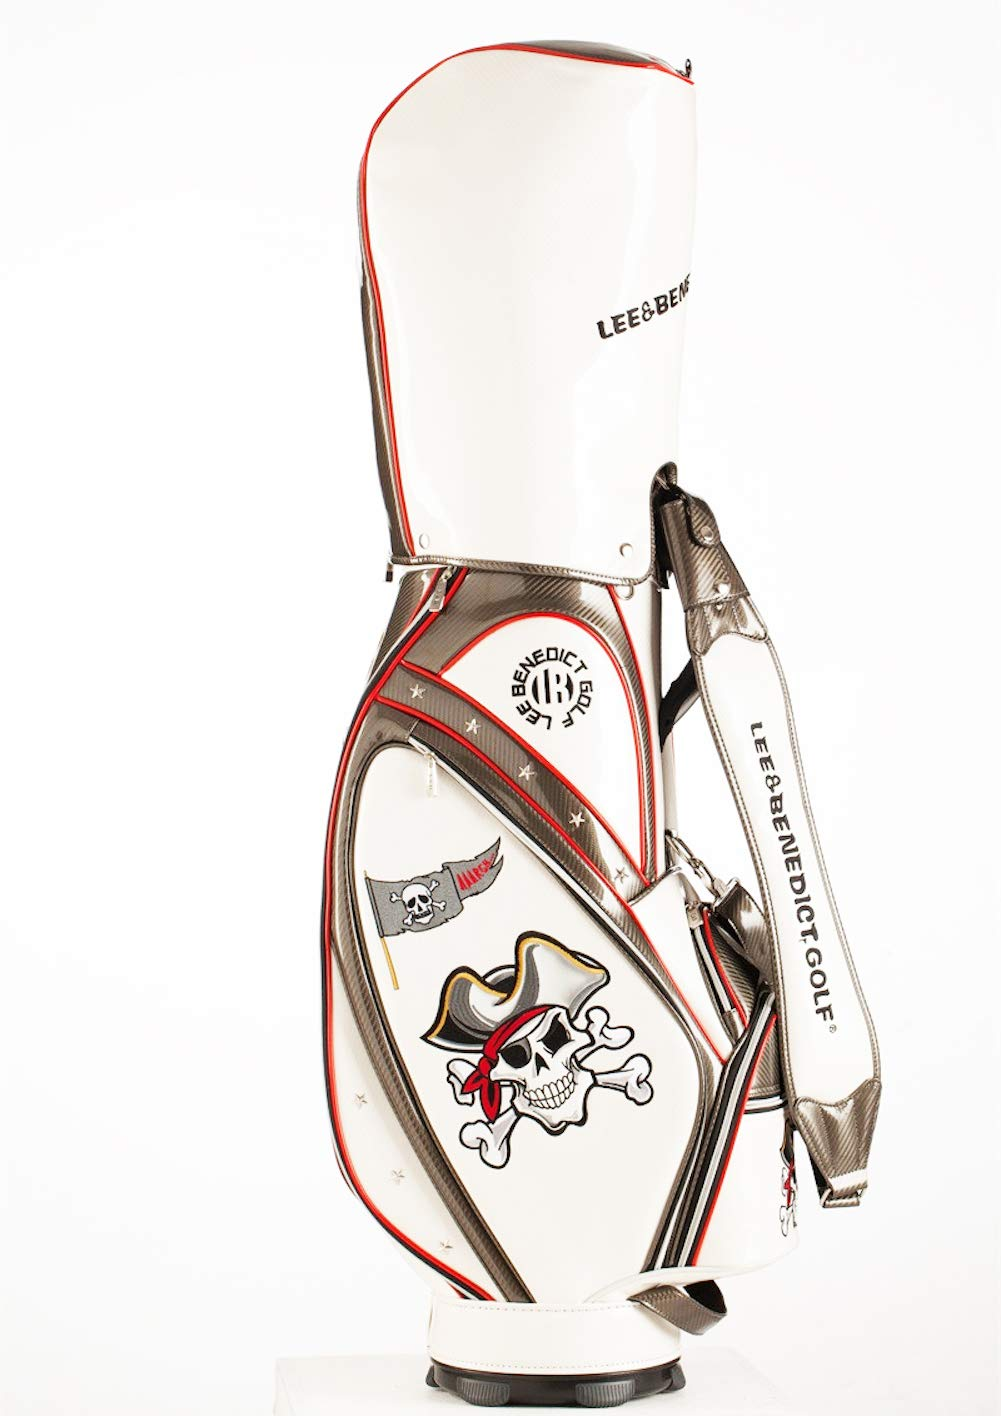 L&B キャディバッグ ゴルフバック 9.5インチ 約4.95kg ユニセックス LB1801  ホワイト B07MJKJQMQ